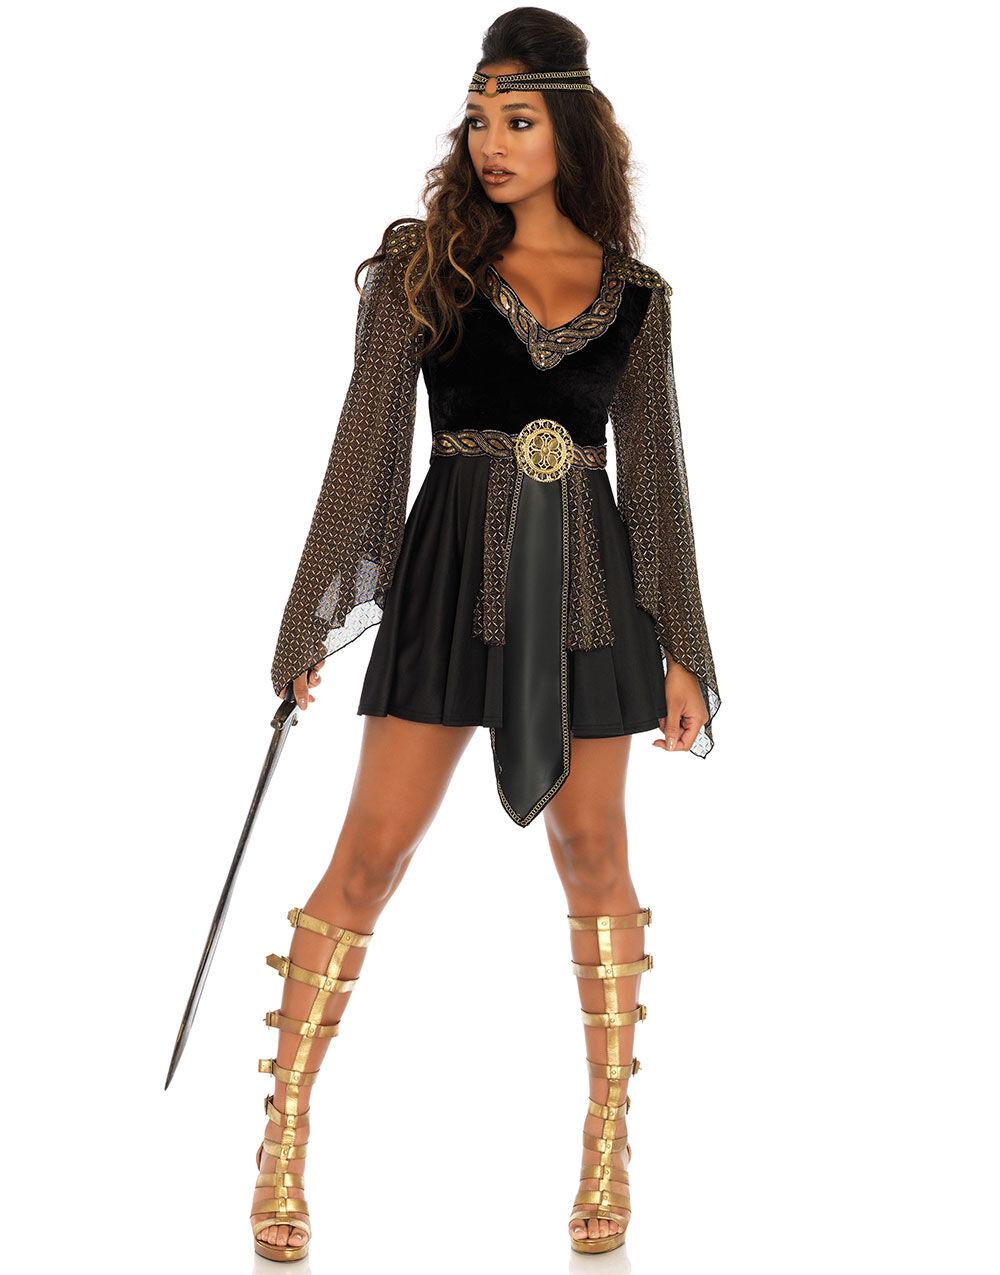 Diva Amazon Warrior - Damekostyme